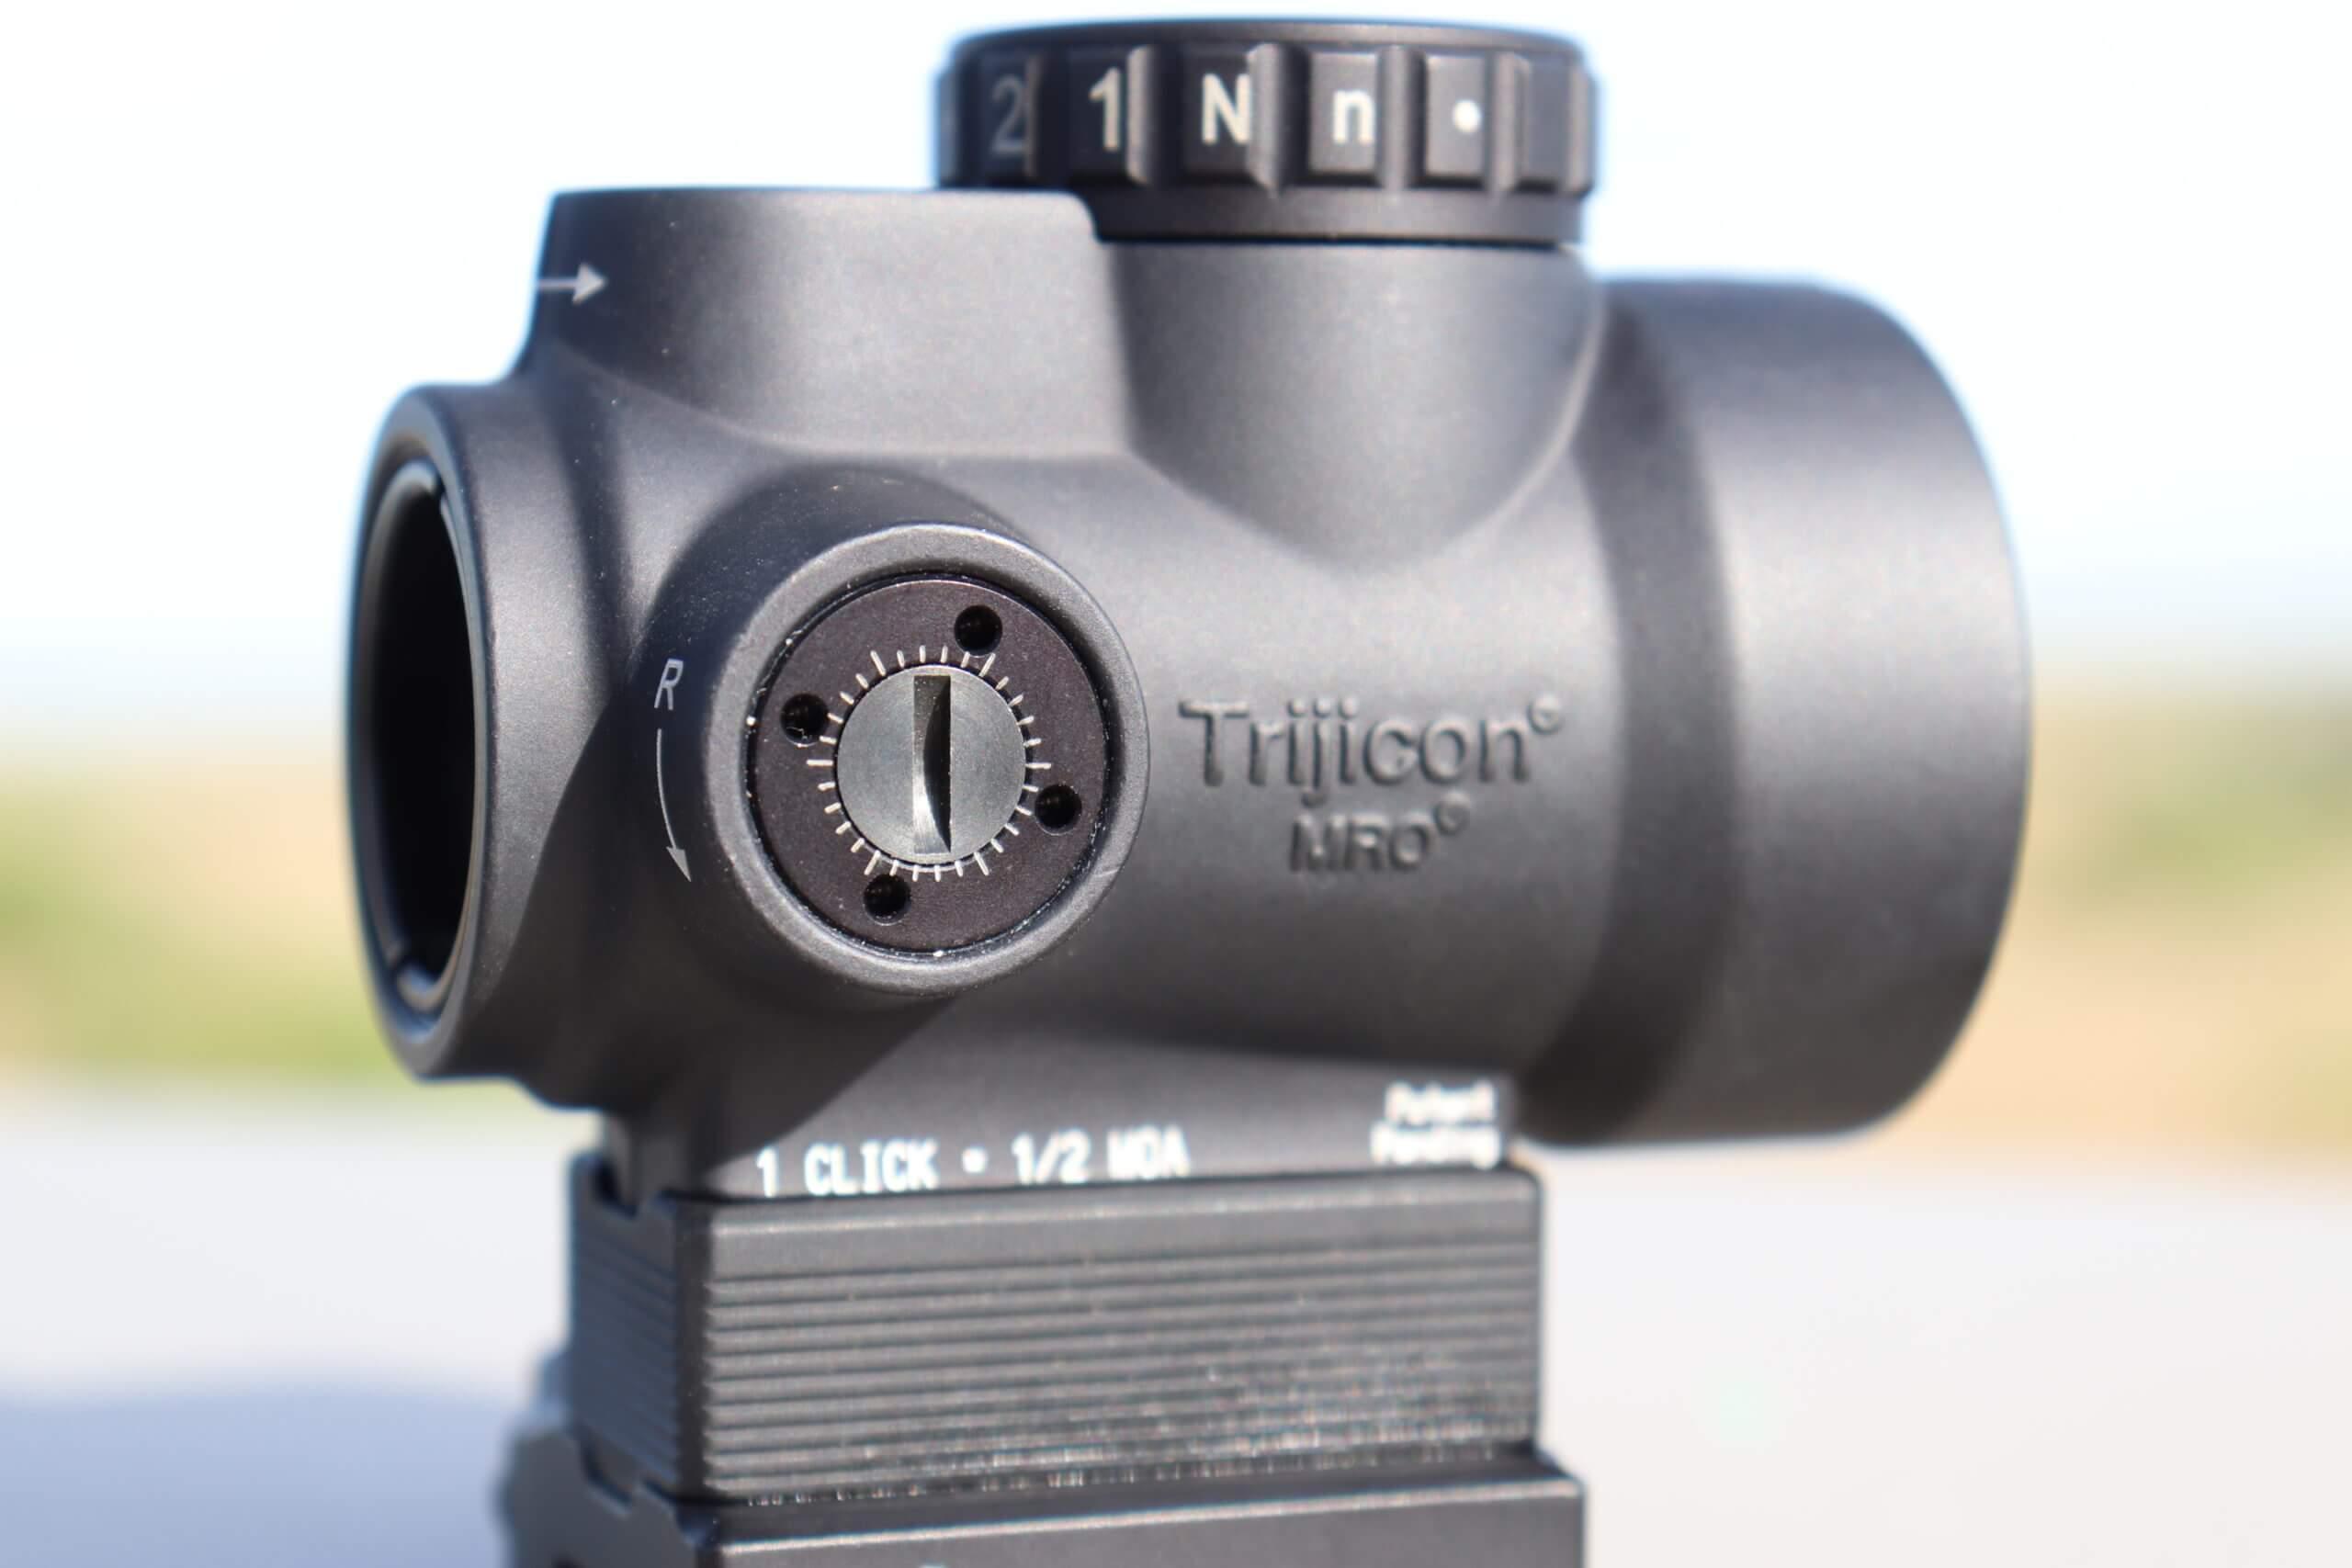 Best Deal in Red Dots: Trijicon MRO